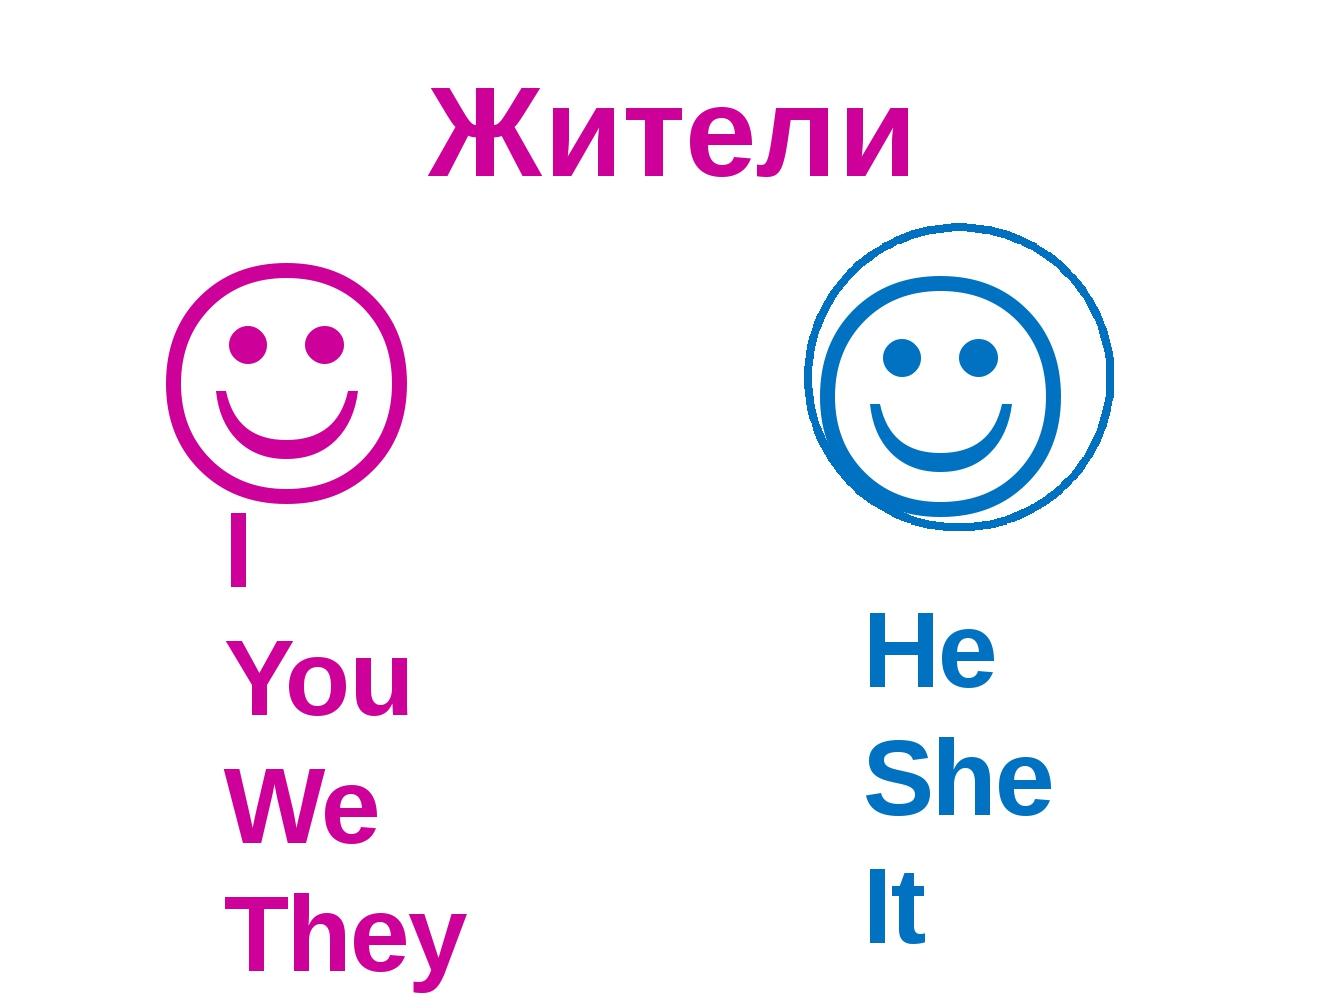 Жители I You We They   He She It